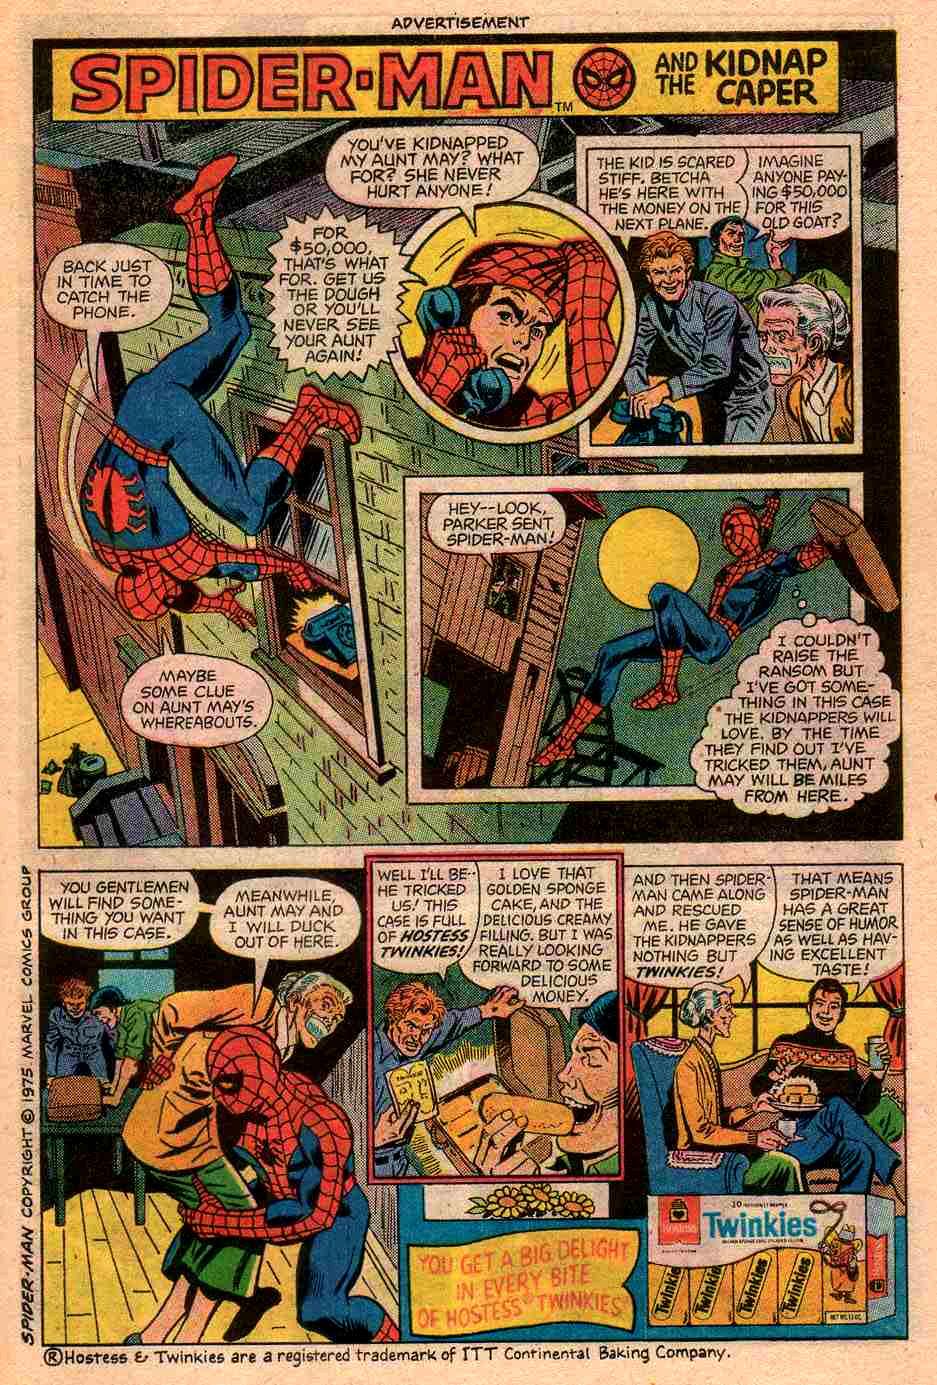 comic strip hostess strips superheroes books spiderman spider comics 1970 tribute selling heroes marvel twinkies funny geektyrant retro super dc